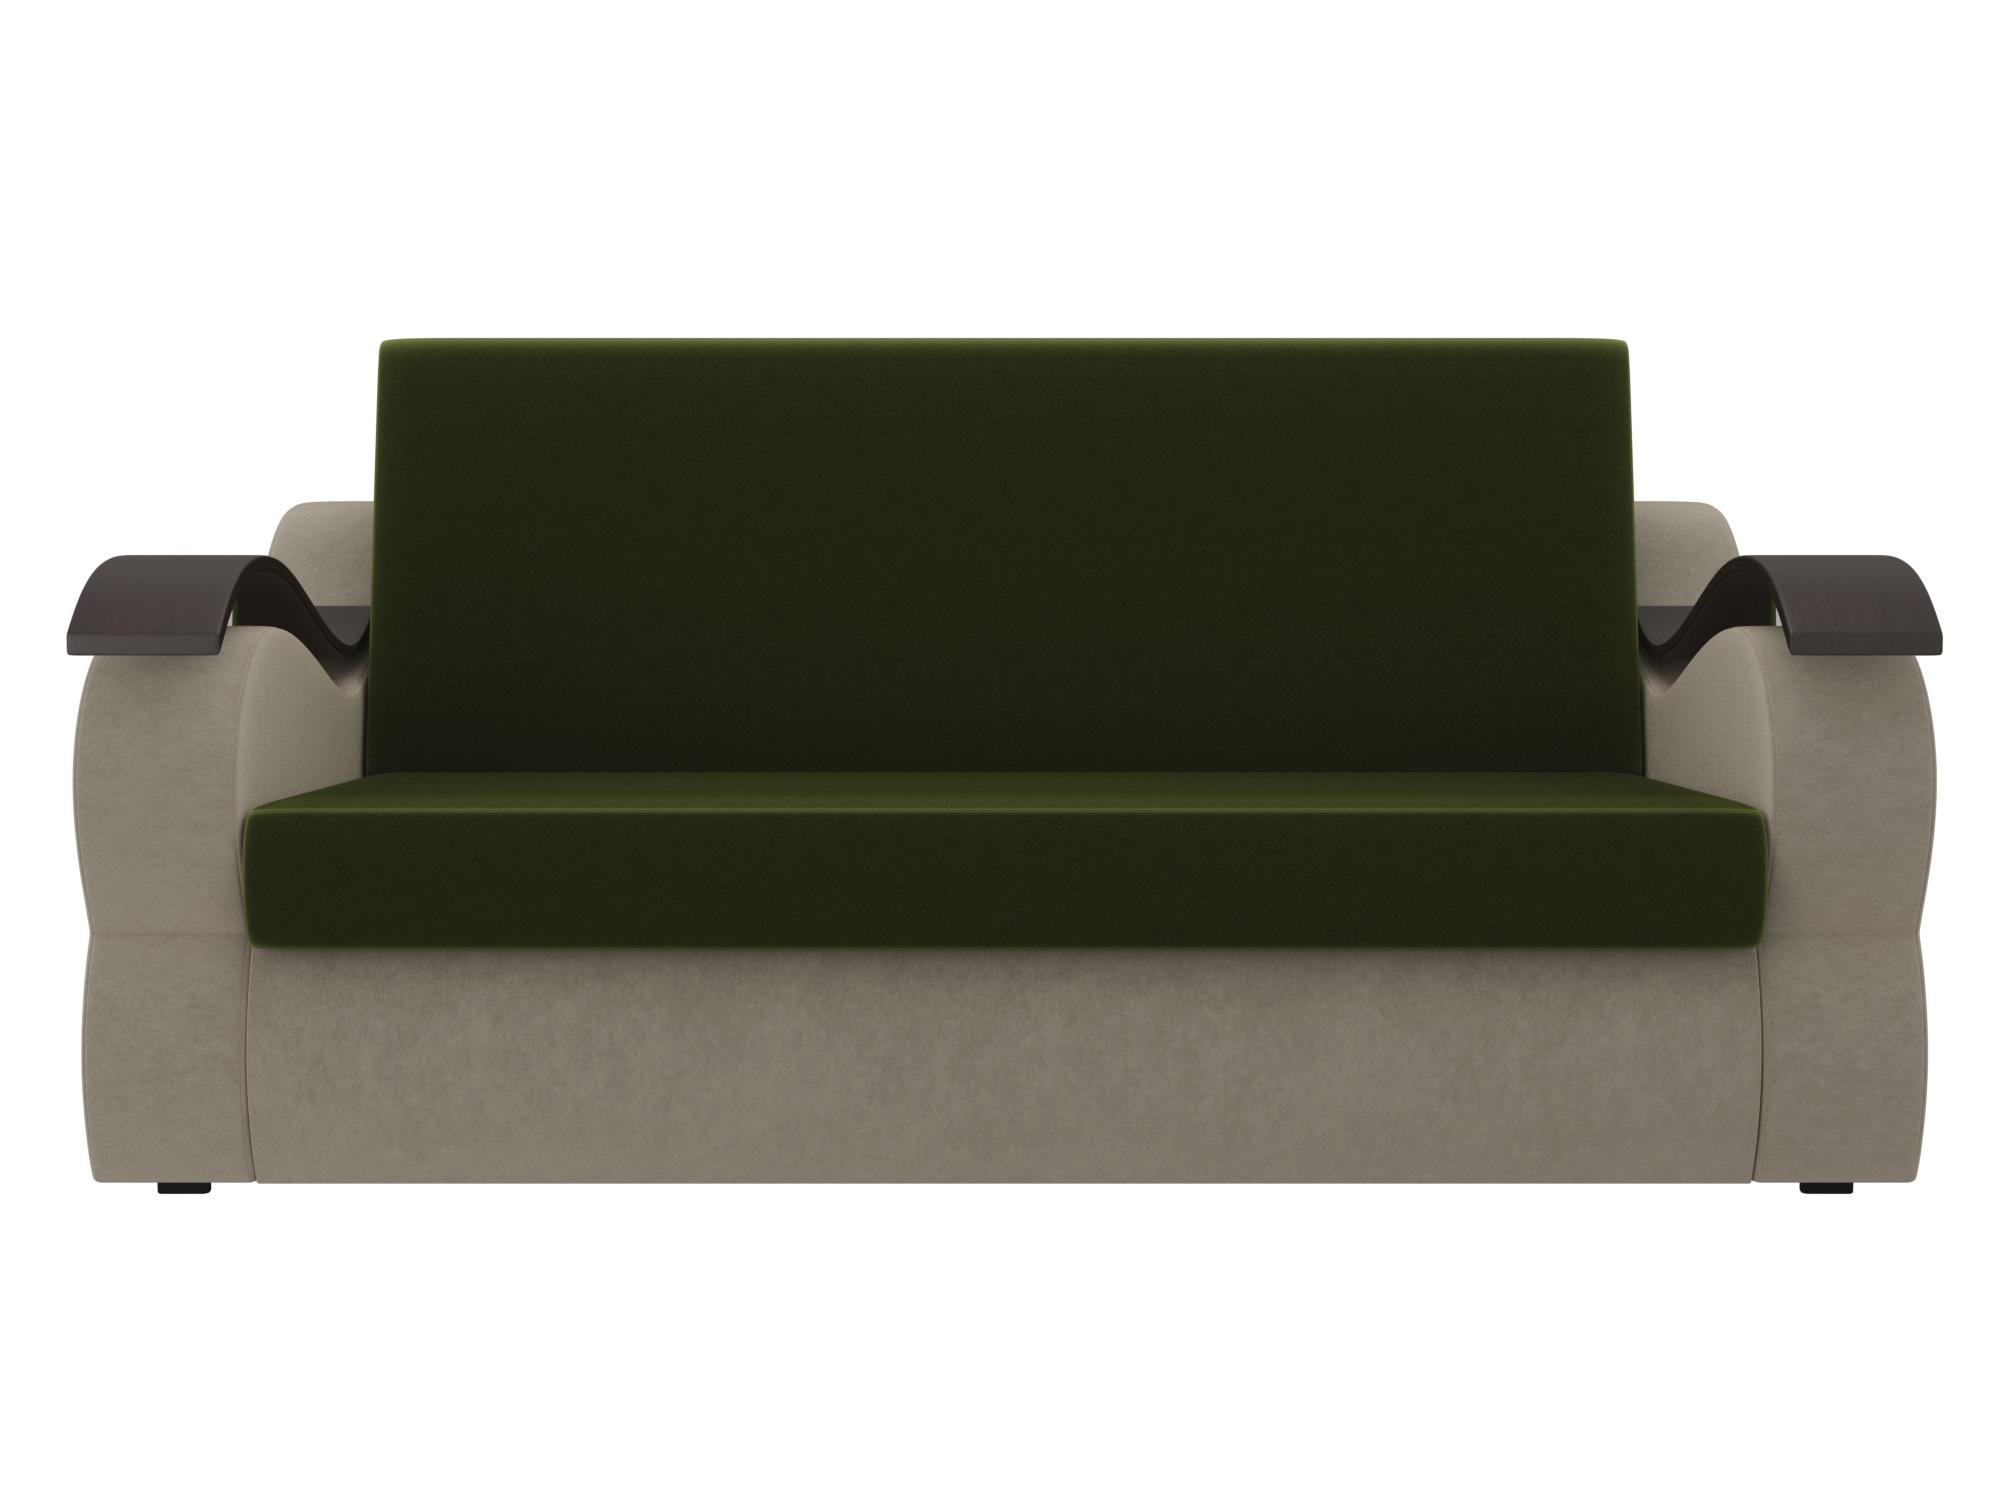 Диван Меркурий (140х190) MebelVia Бежевый, Зеленый